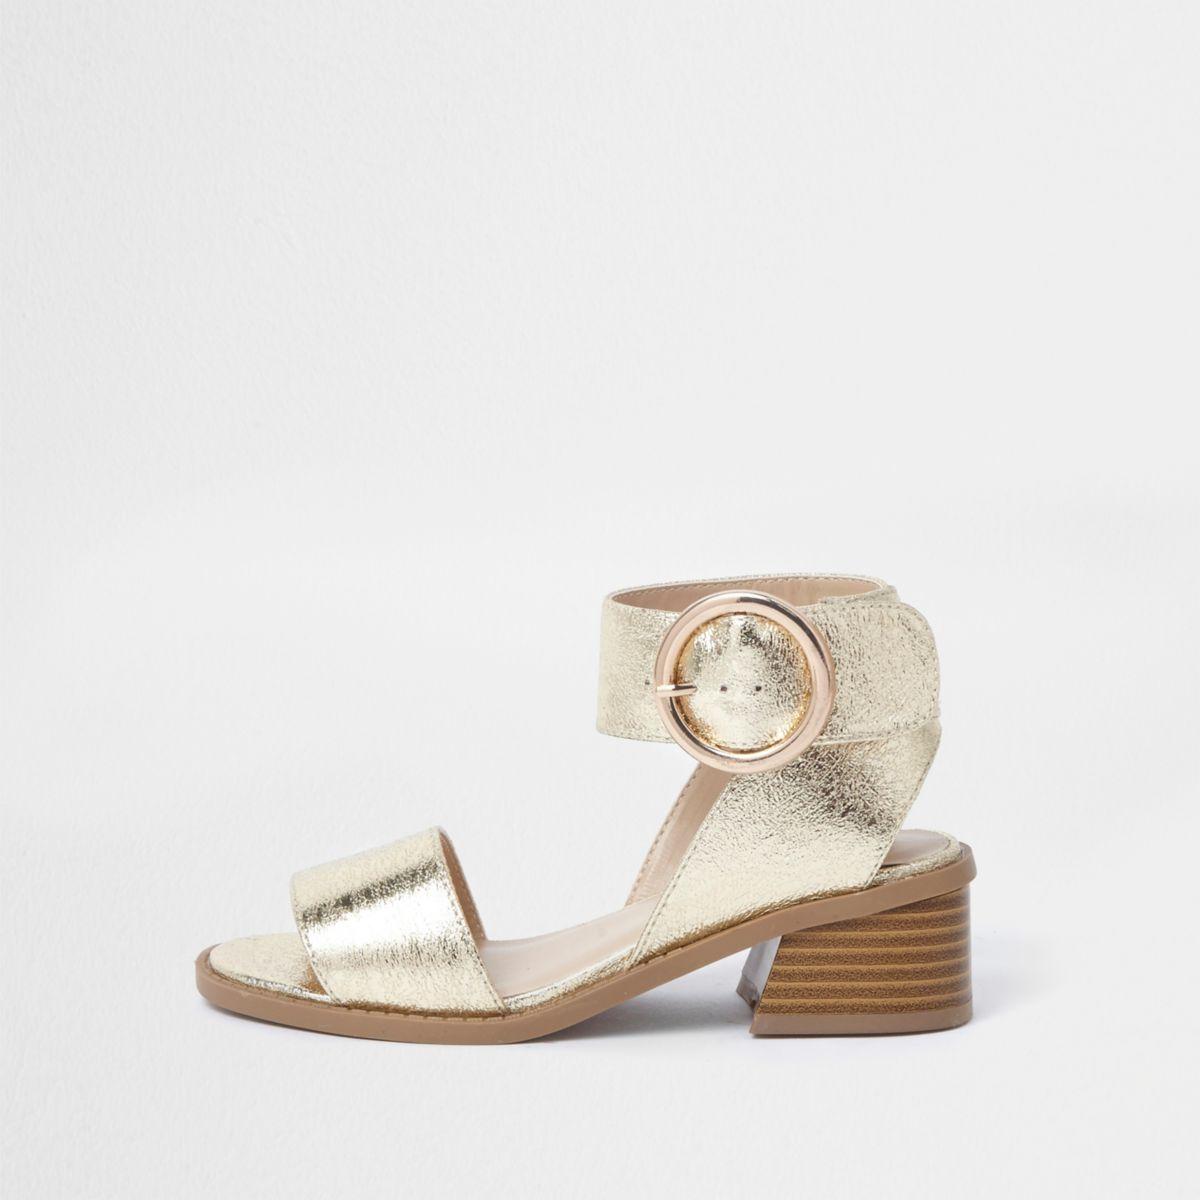 Sandalen in Gold-Metallic